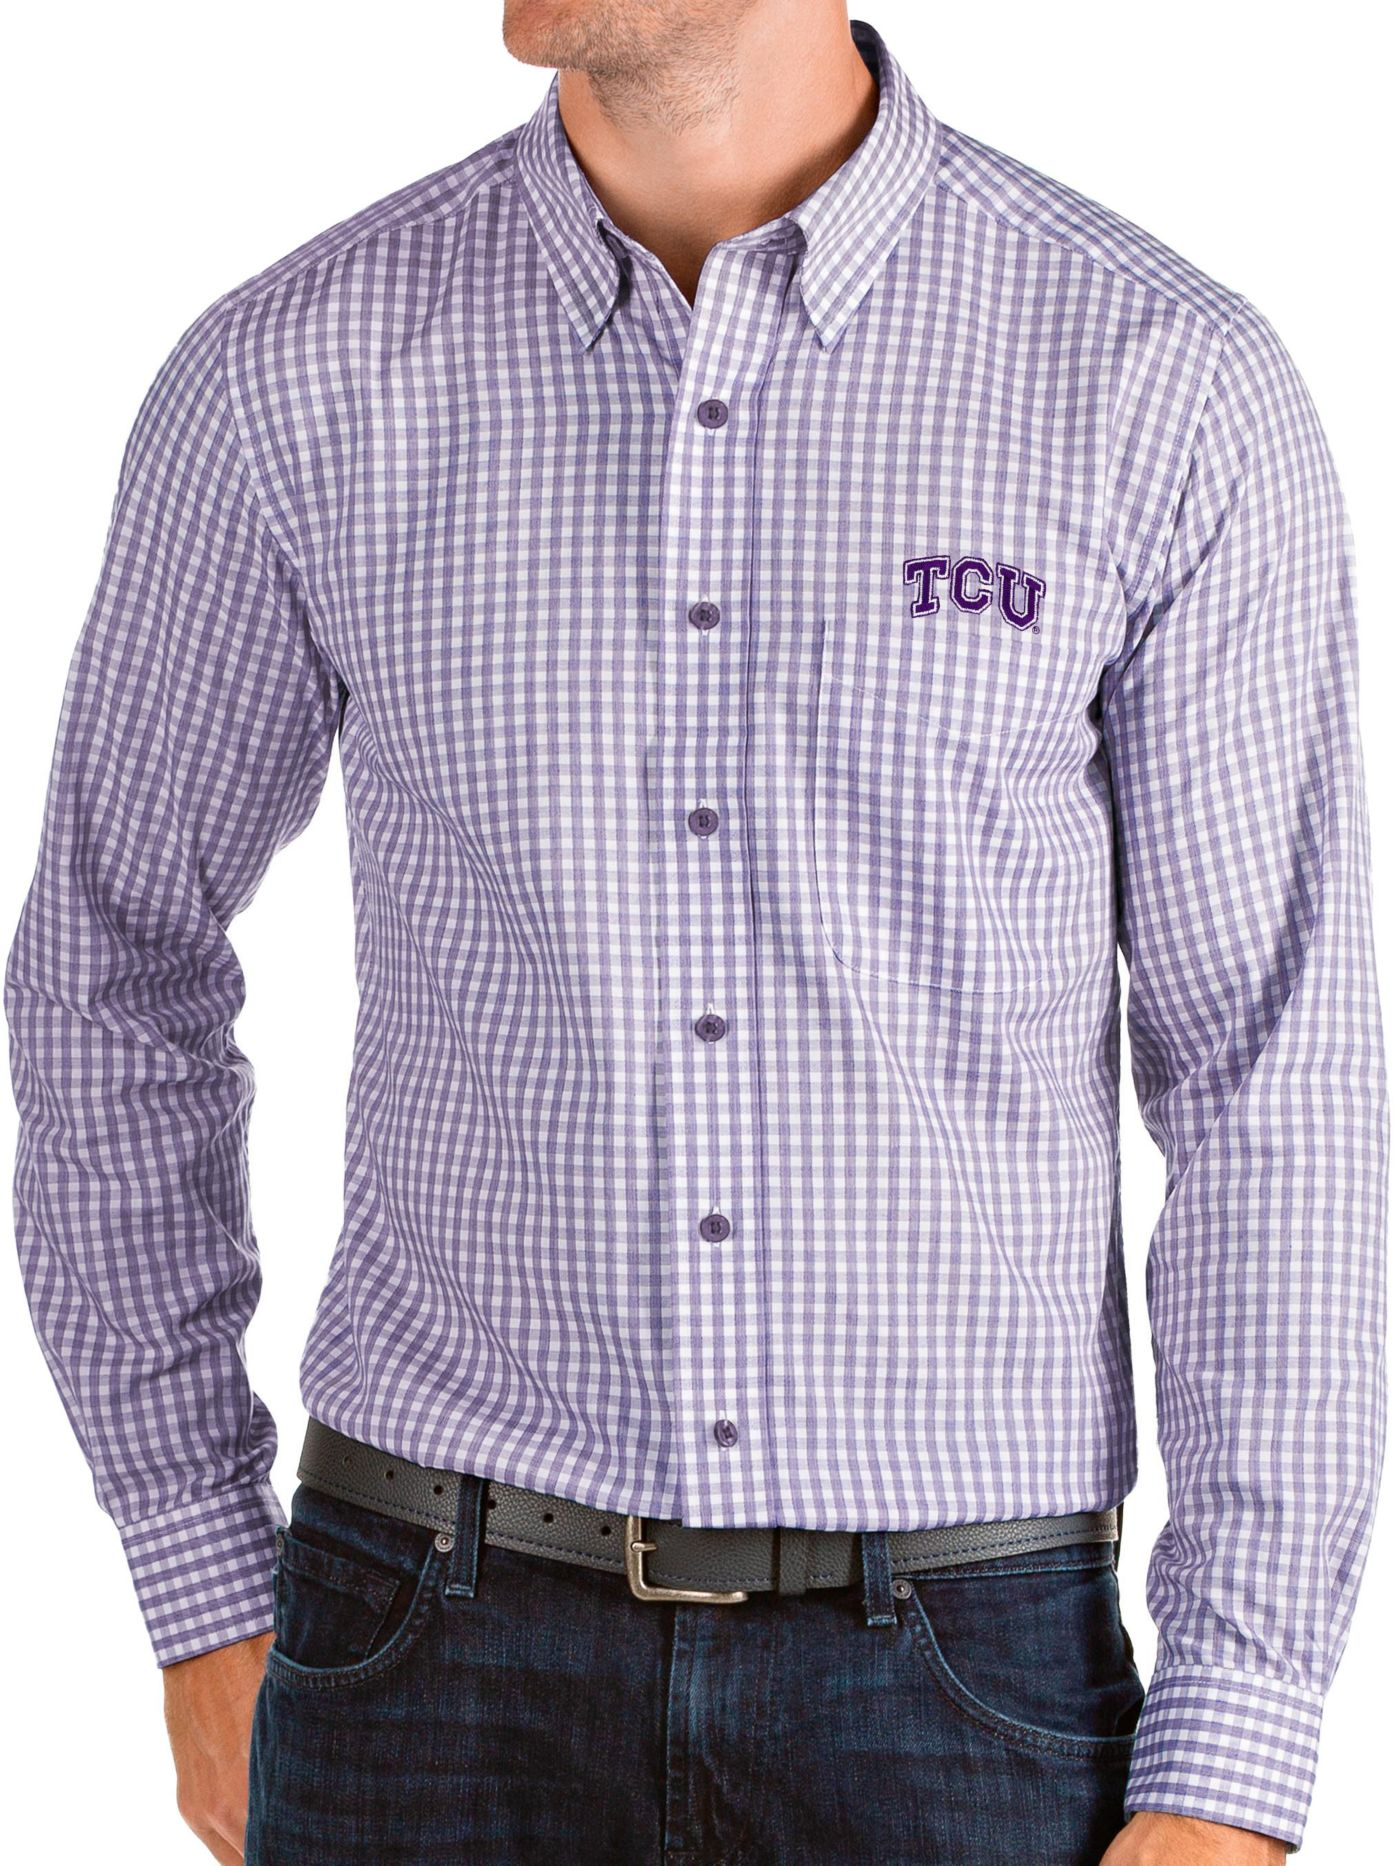 Antigua Men's TCU Horned Frogs Purple Structure Button Down Long Sleeve Shirt